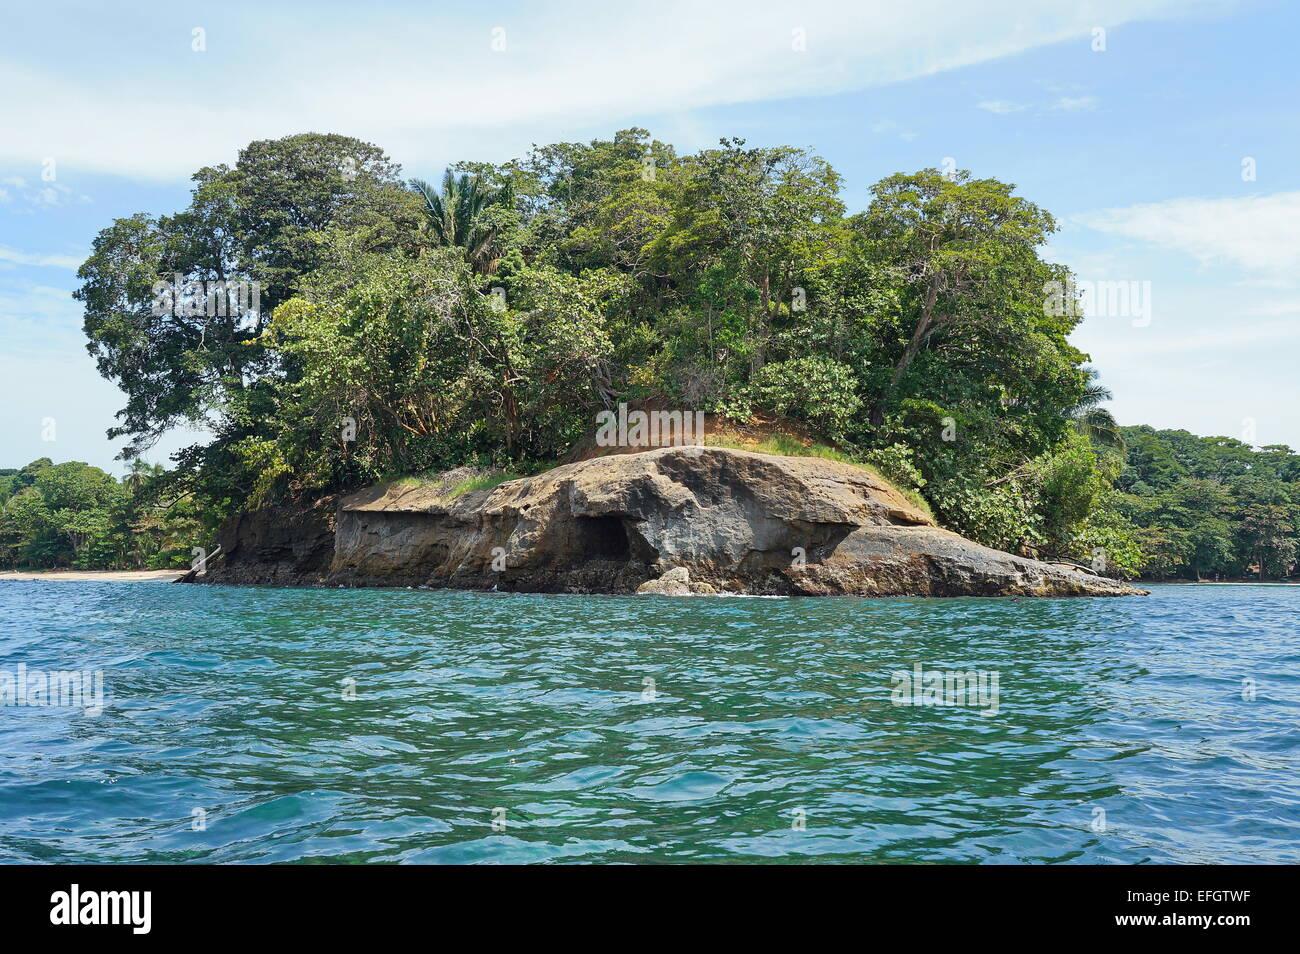 Punta Uva on the Caribbean shore of Costa Rica, Puerto Viejo de Talamanca, Central America - Stock Image